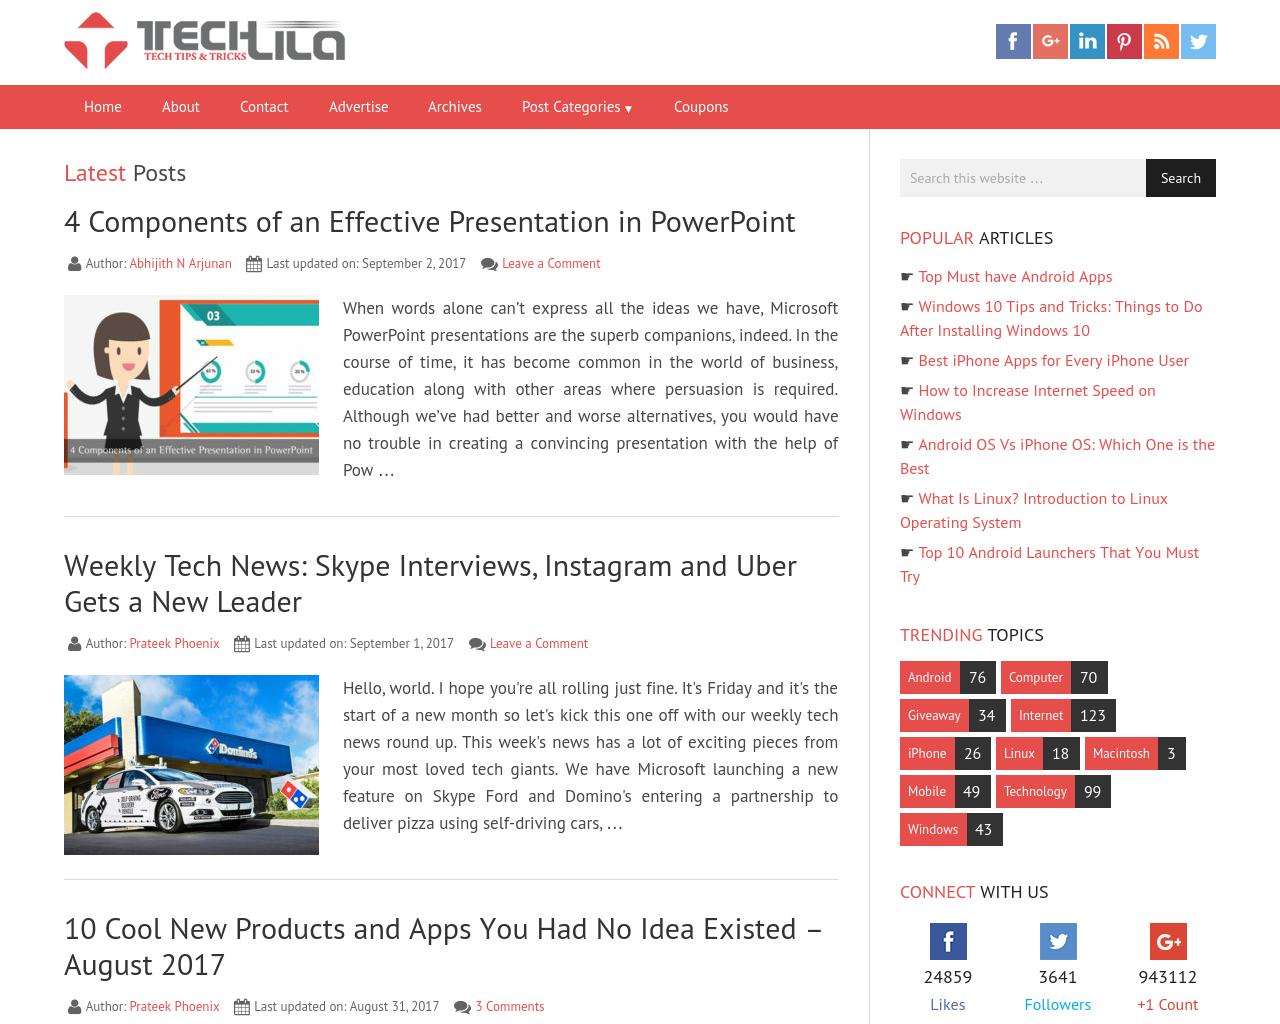 Techlila-Advertising-Reviews-Pricing